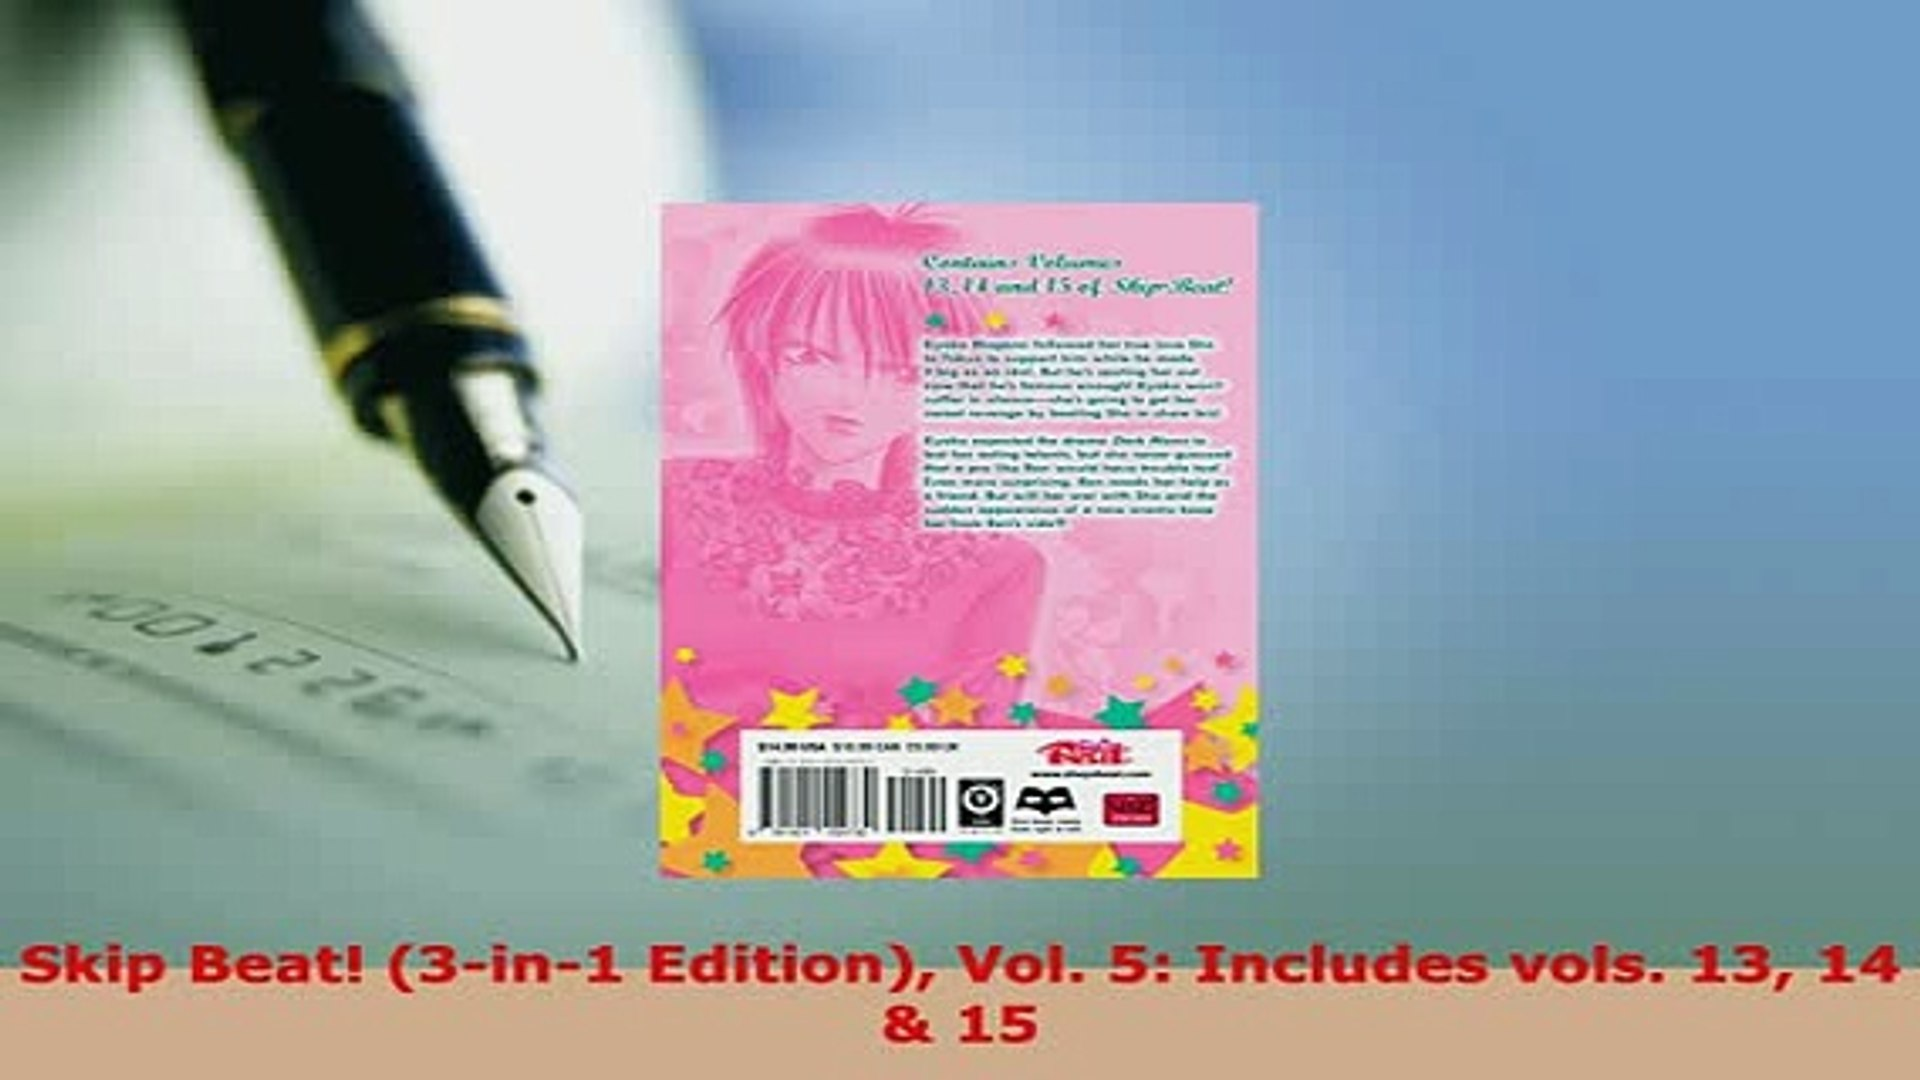 3-in-1 Edition 13 14 /& 15 Vol 5: Includes vols Naruto